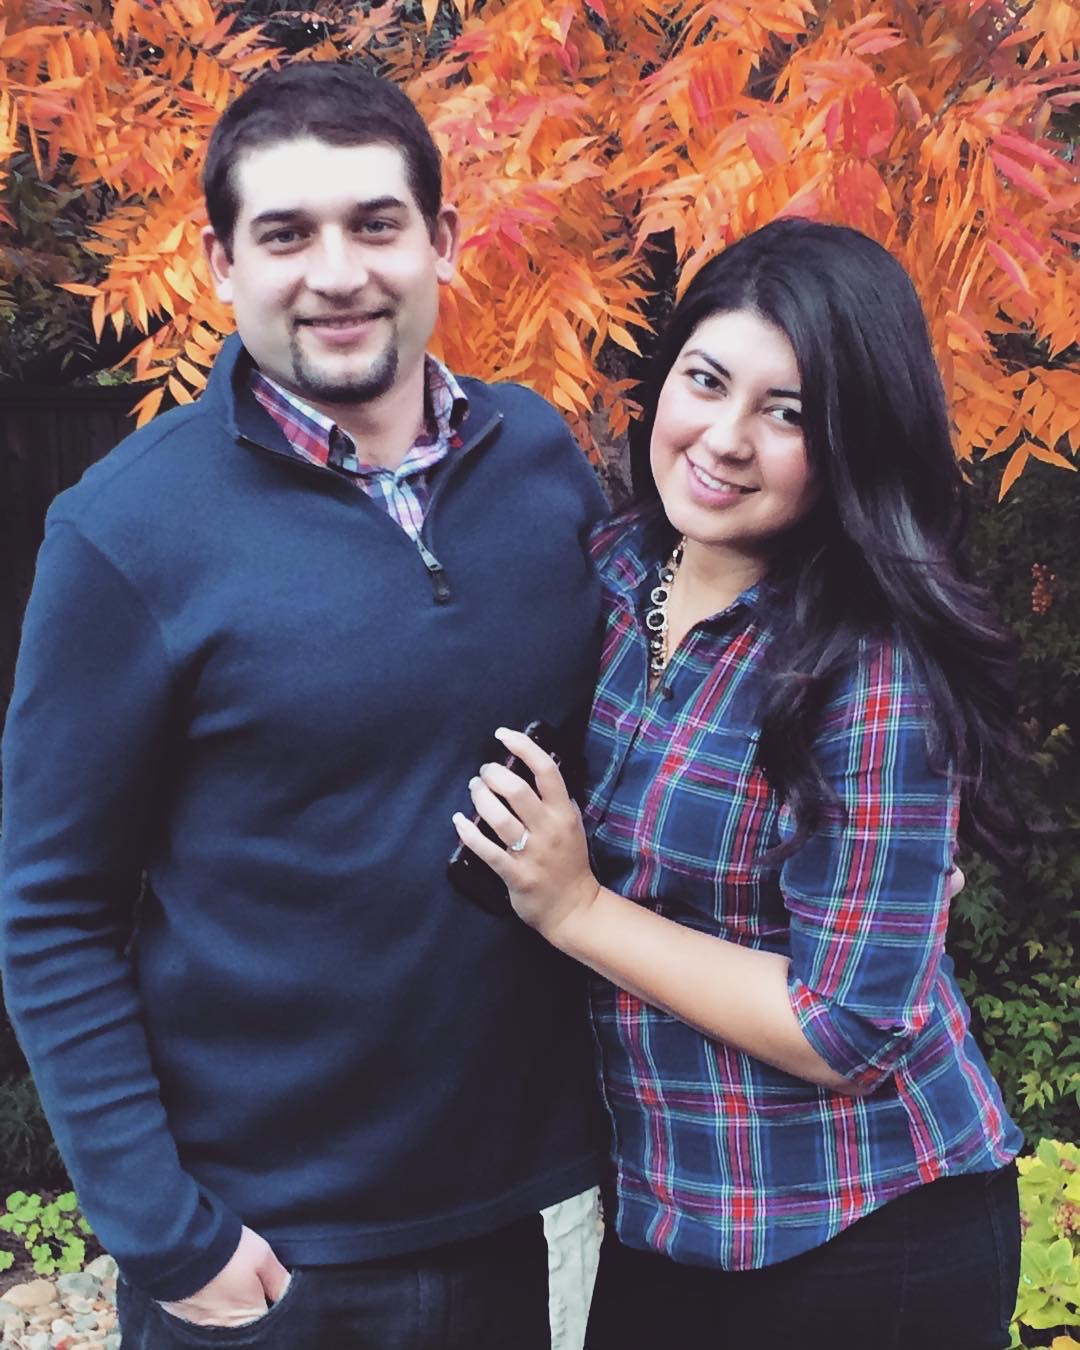 Austin & Joanna Saladin - Owners